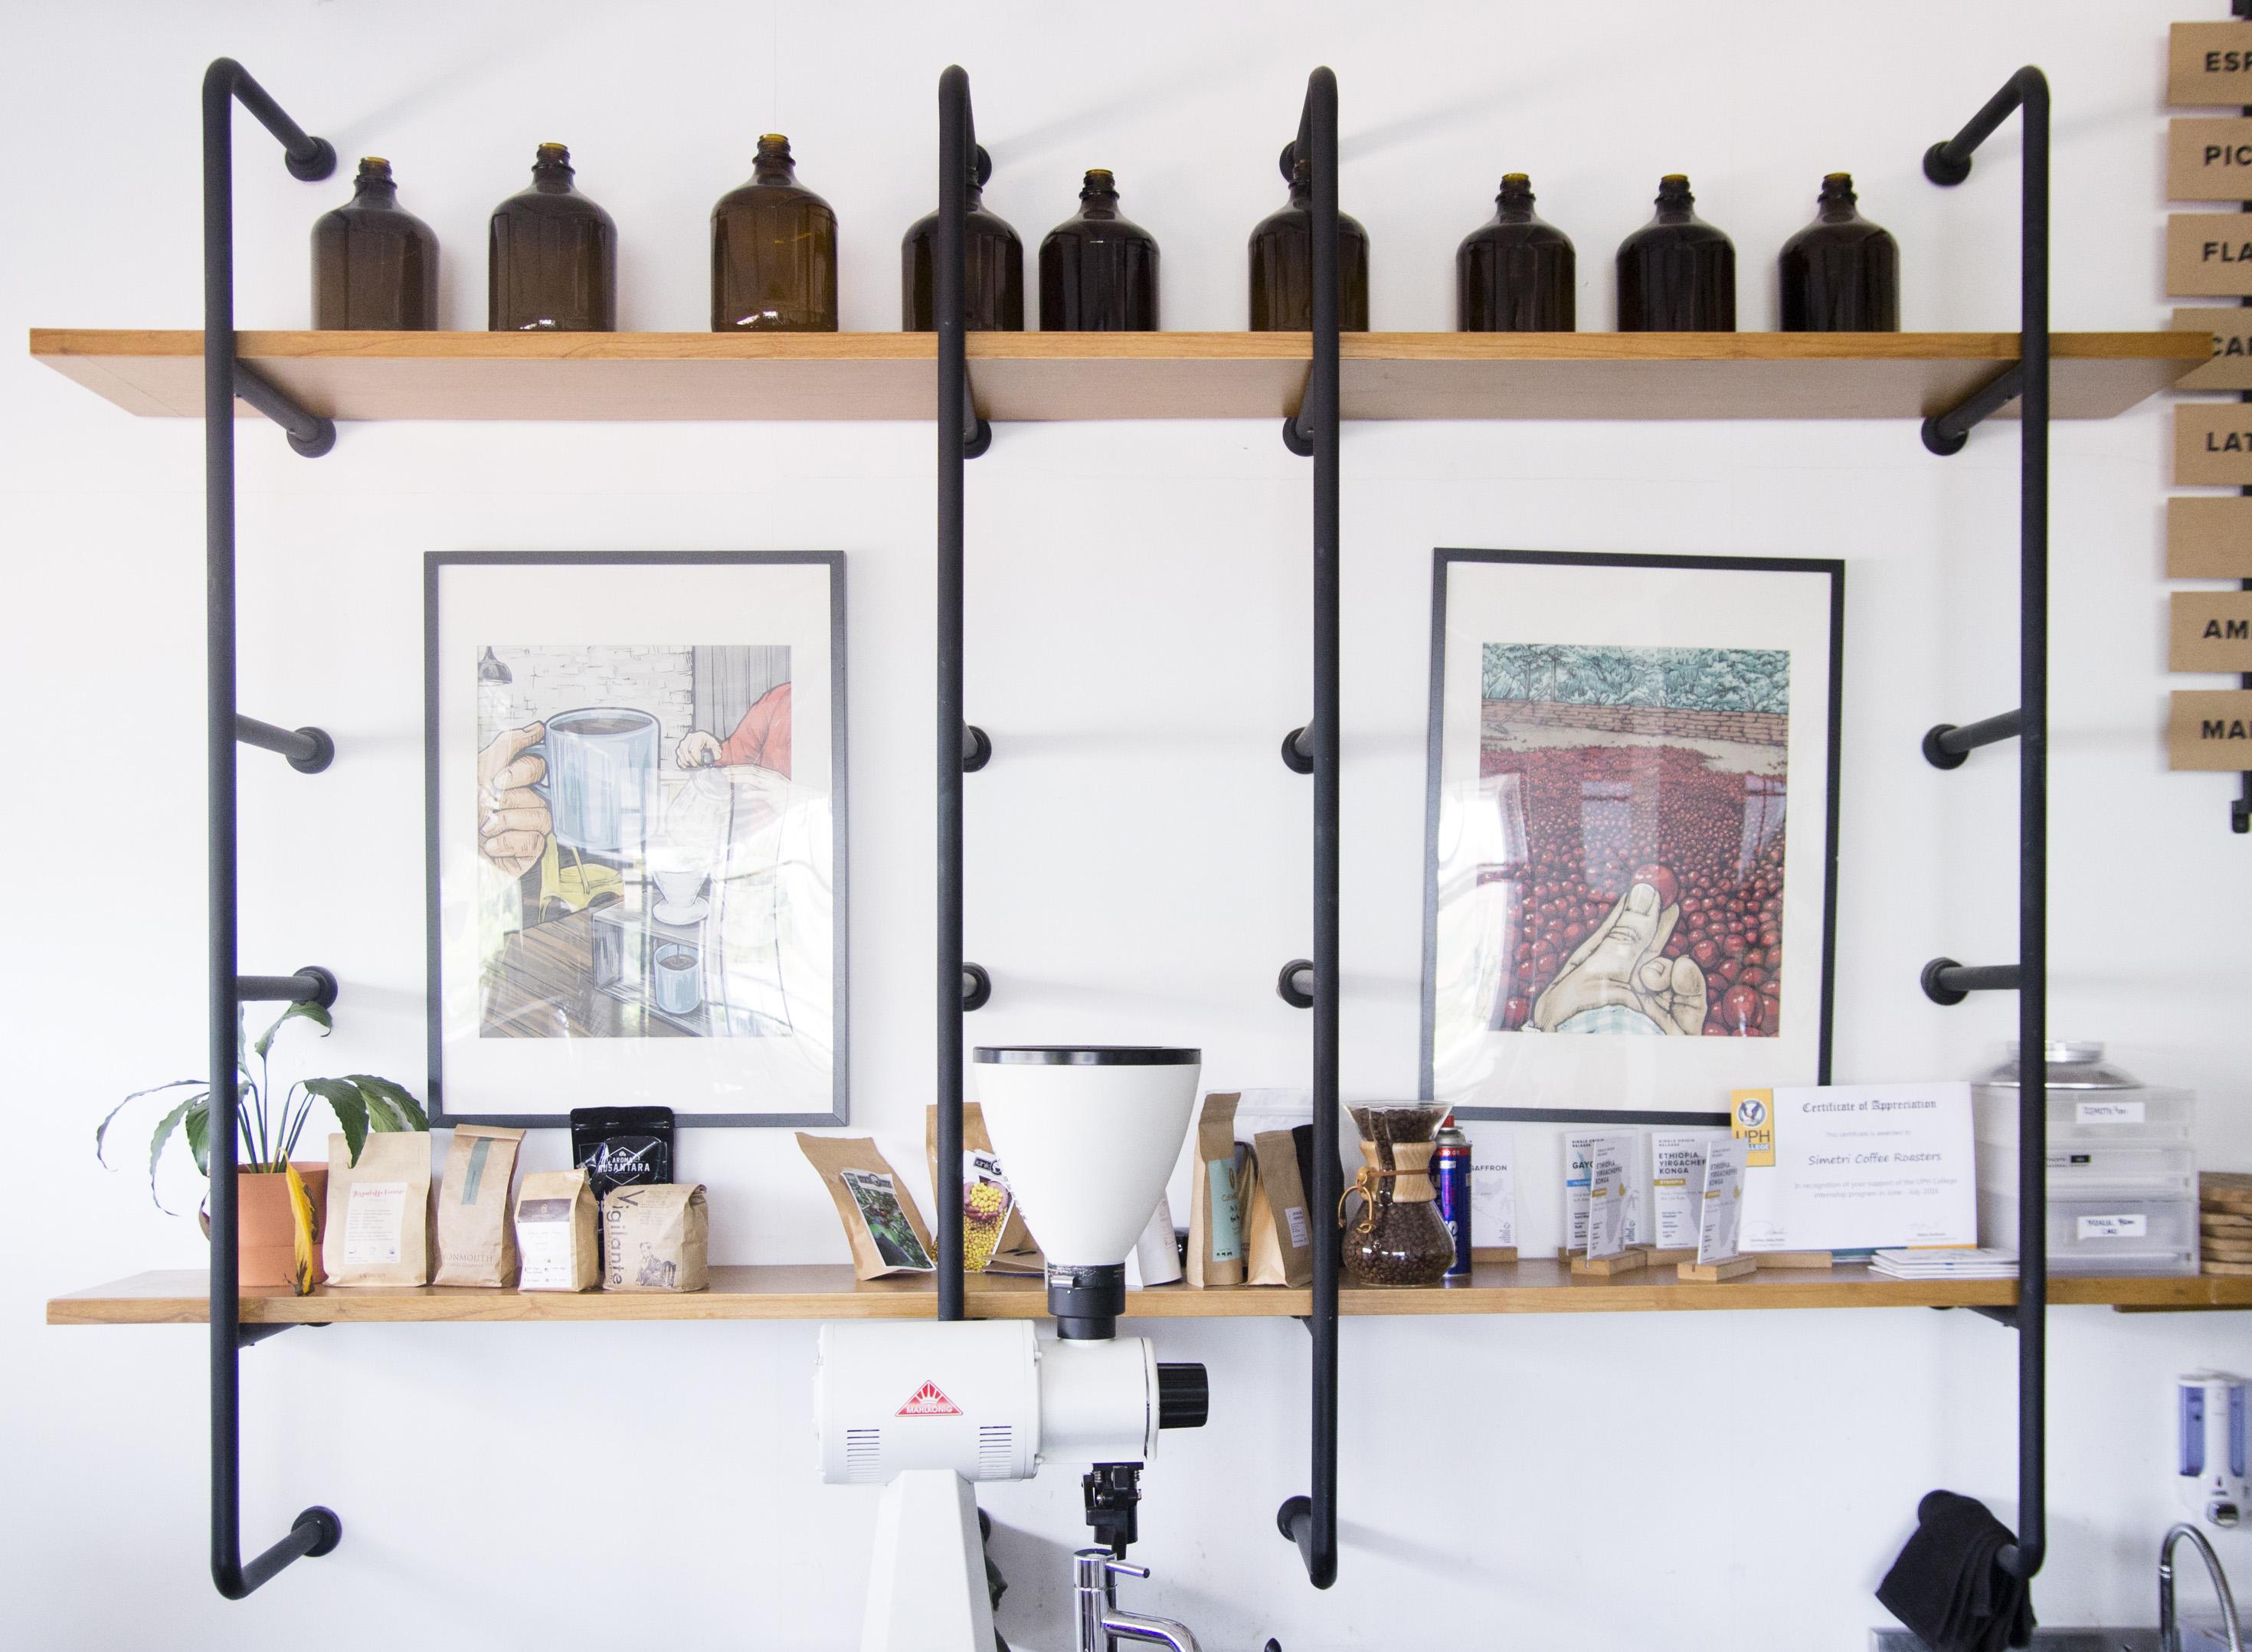 Simetri Coffee Roasters